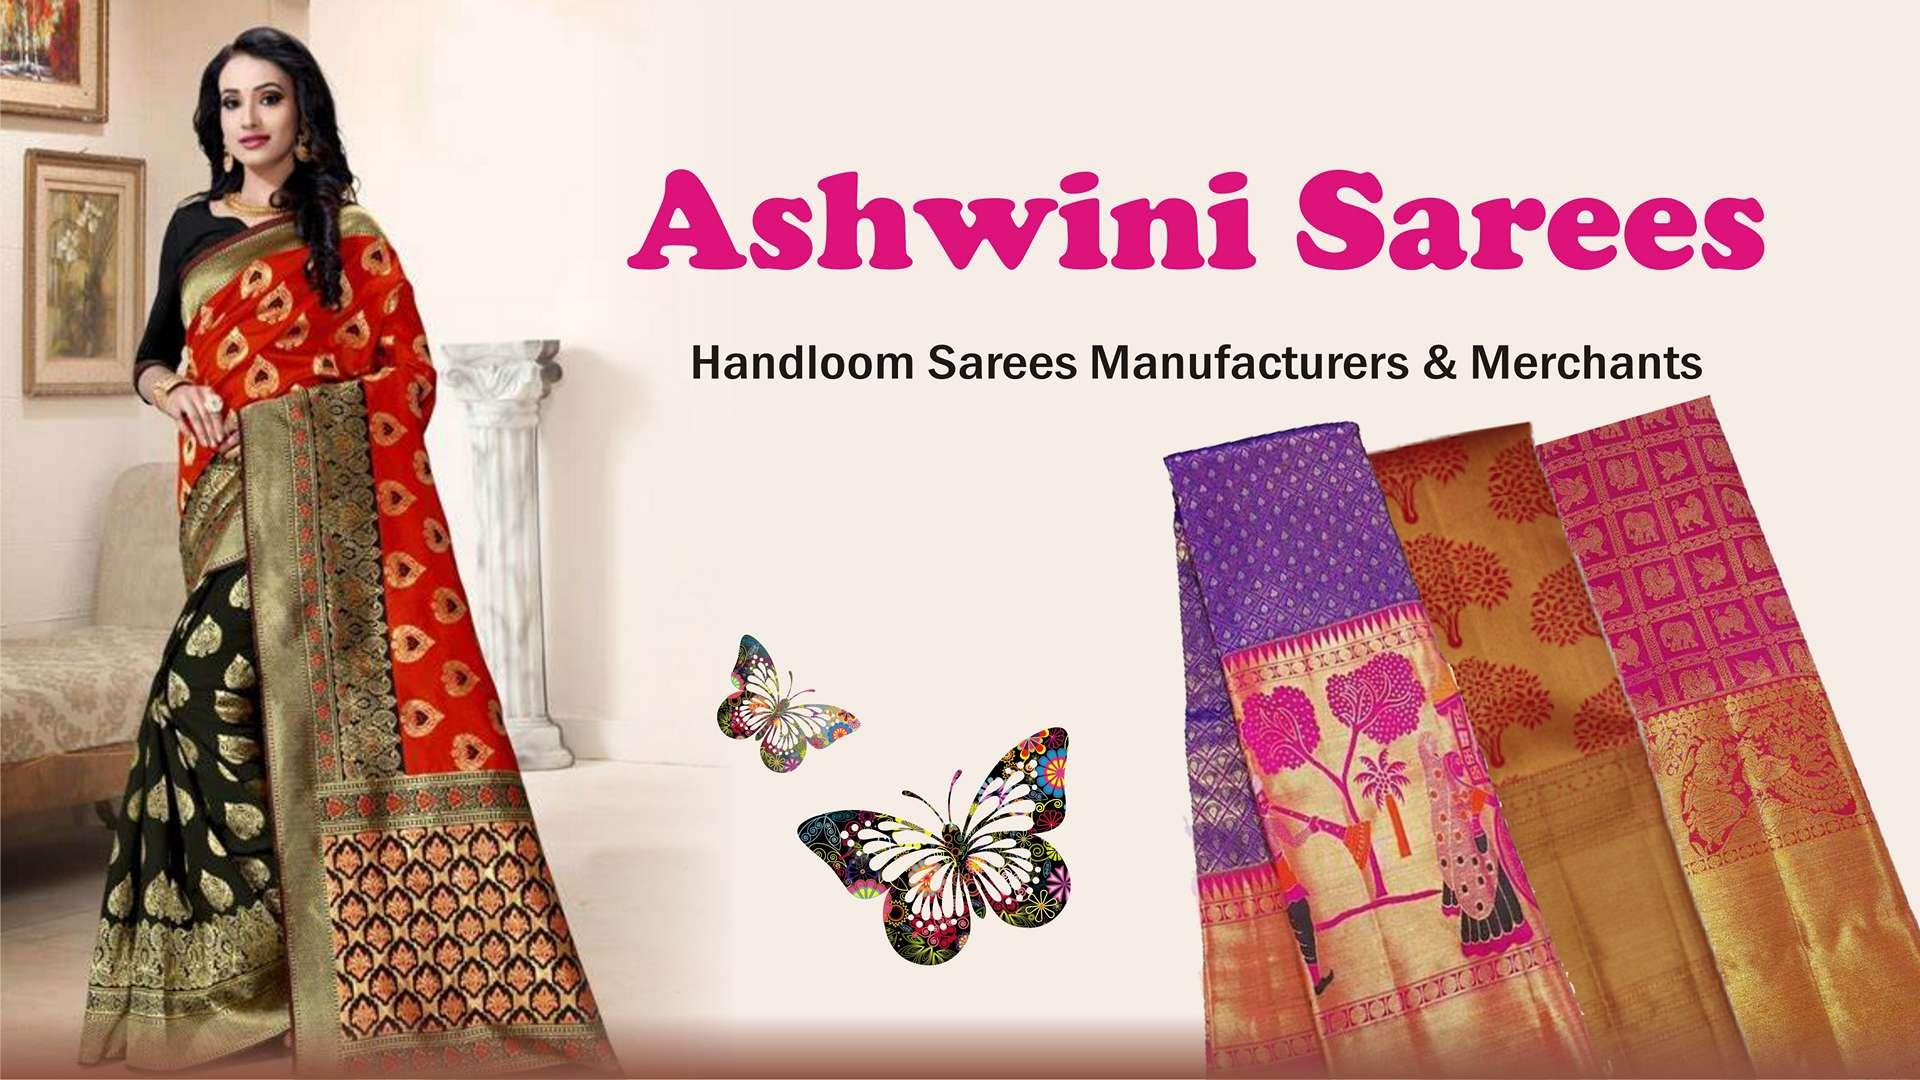 Ashwini Sarees